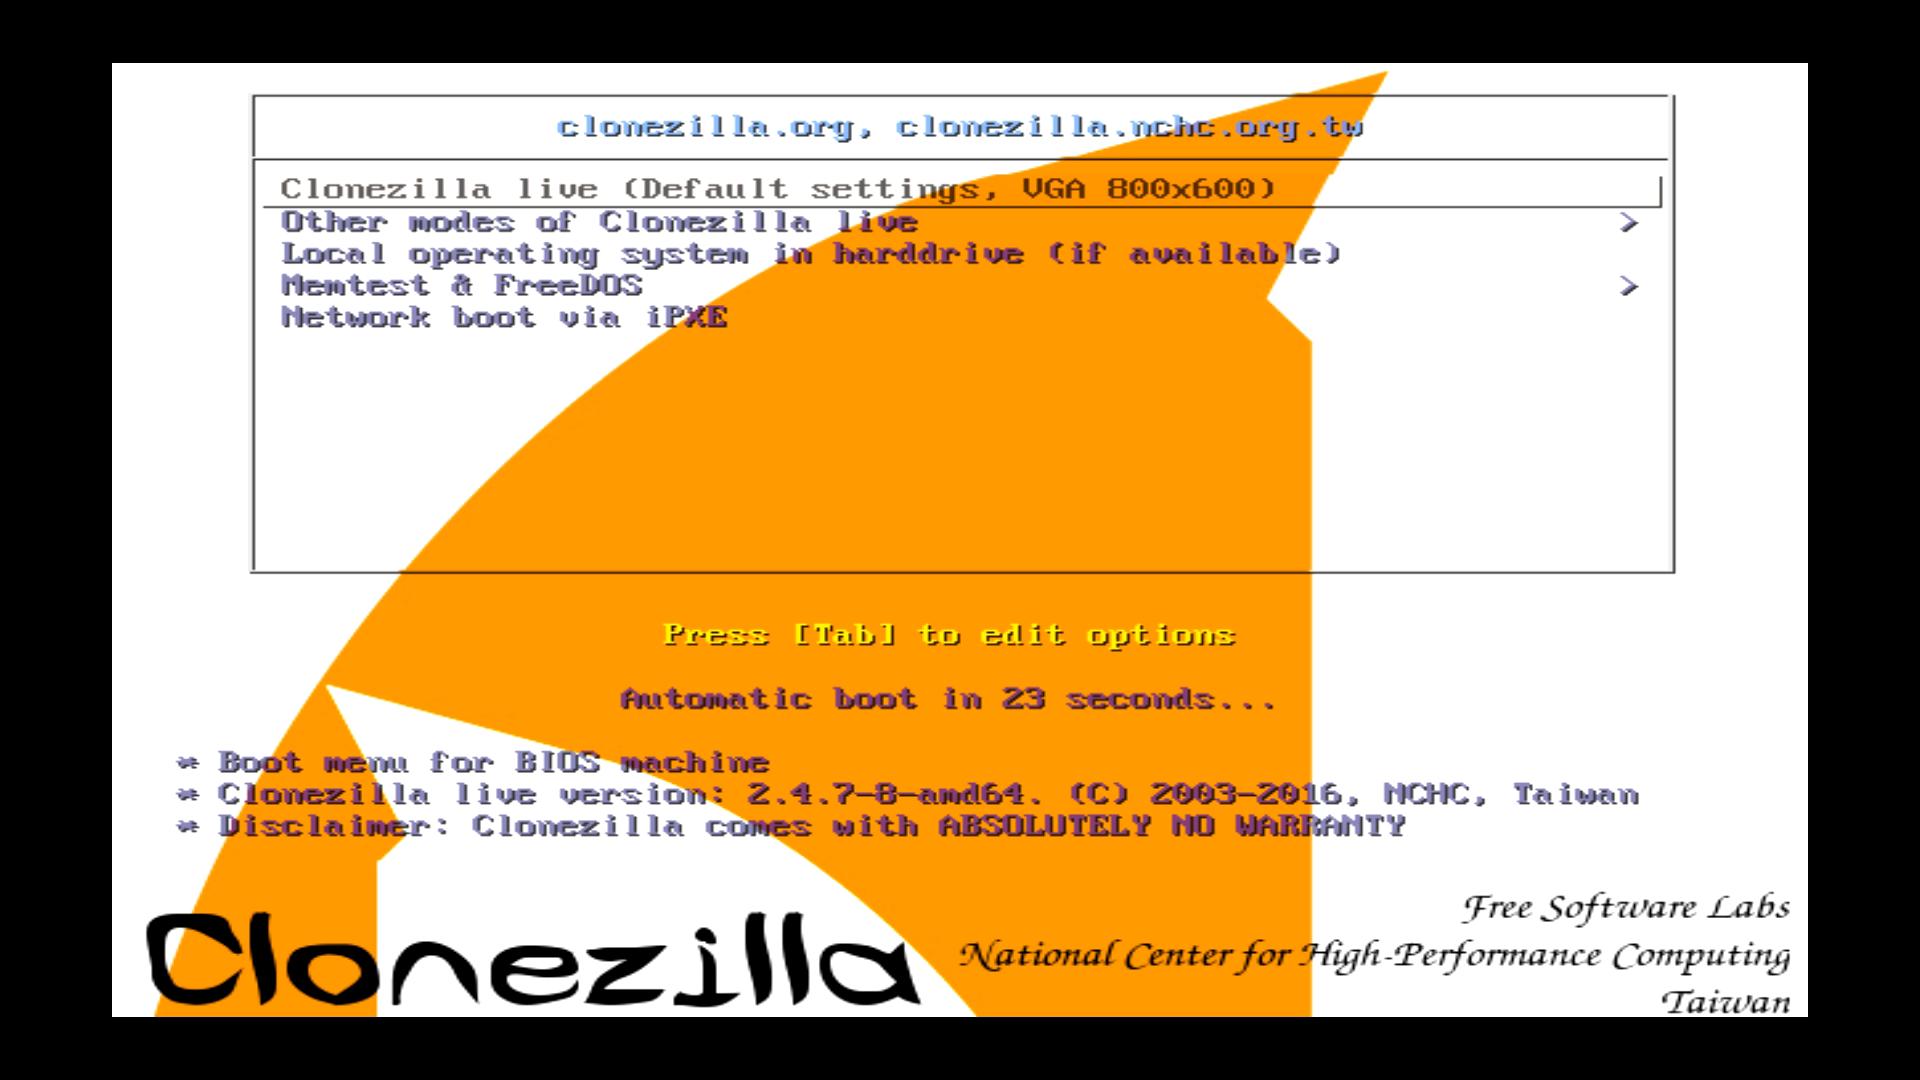 Clonezilla Screenshot 2016-07-21 14-17-38